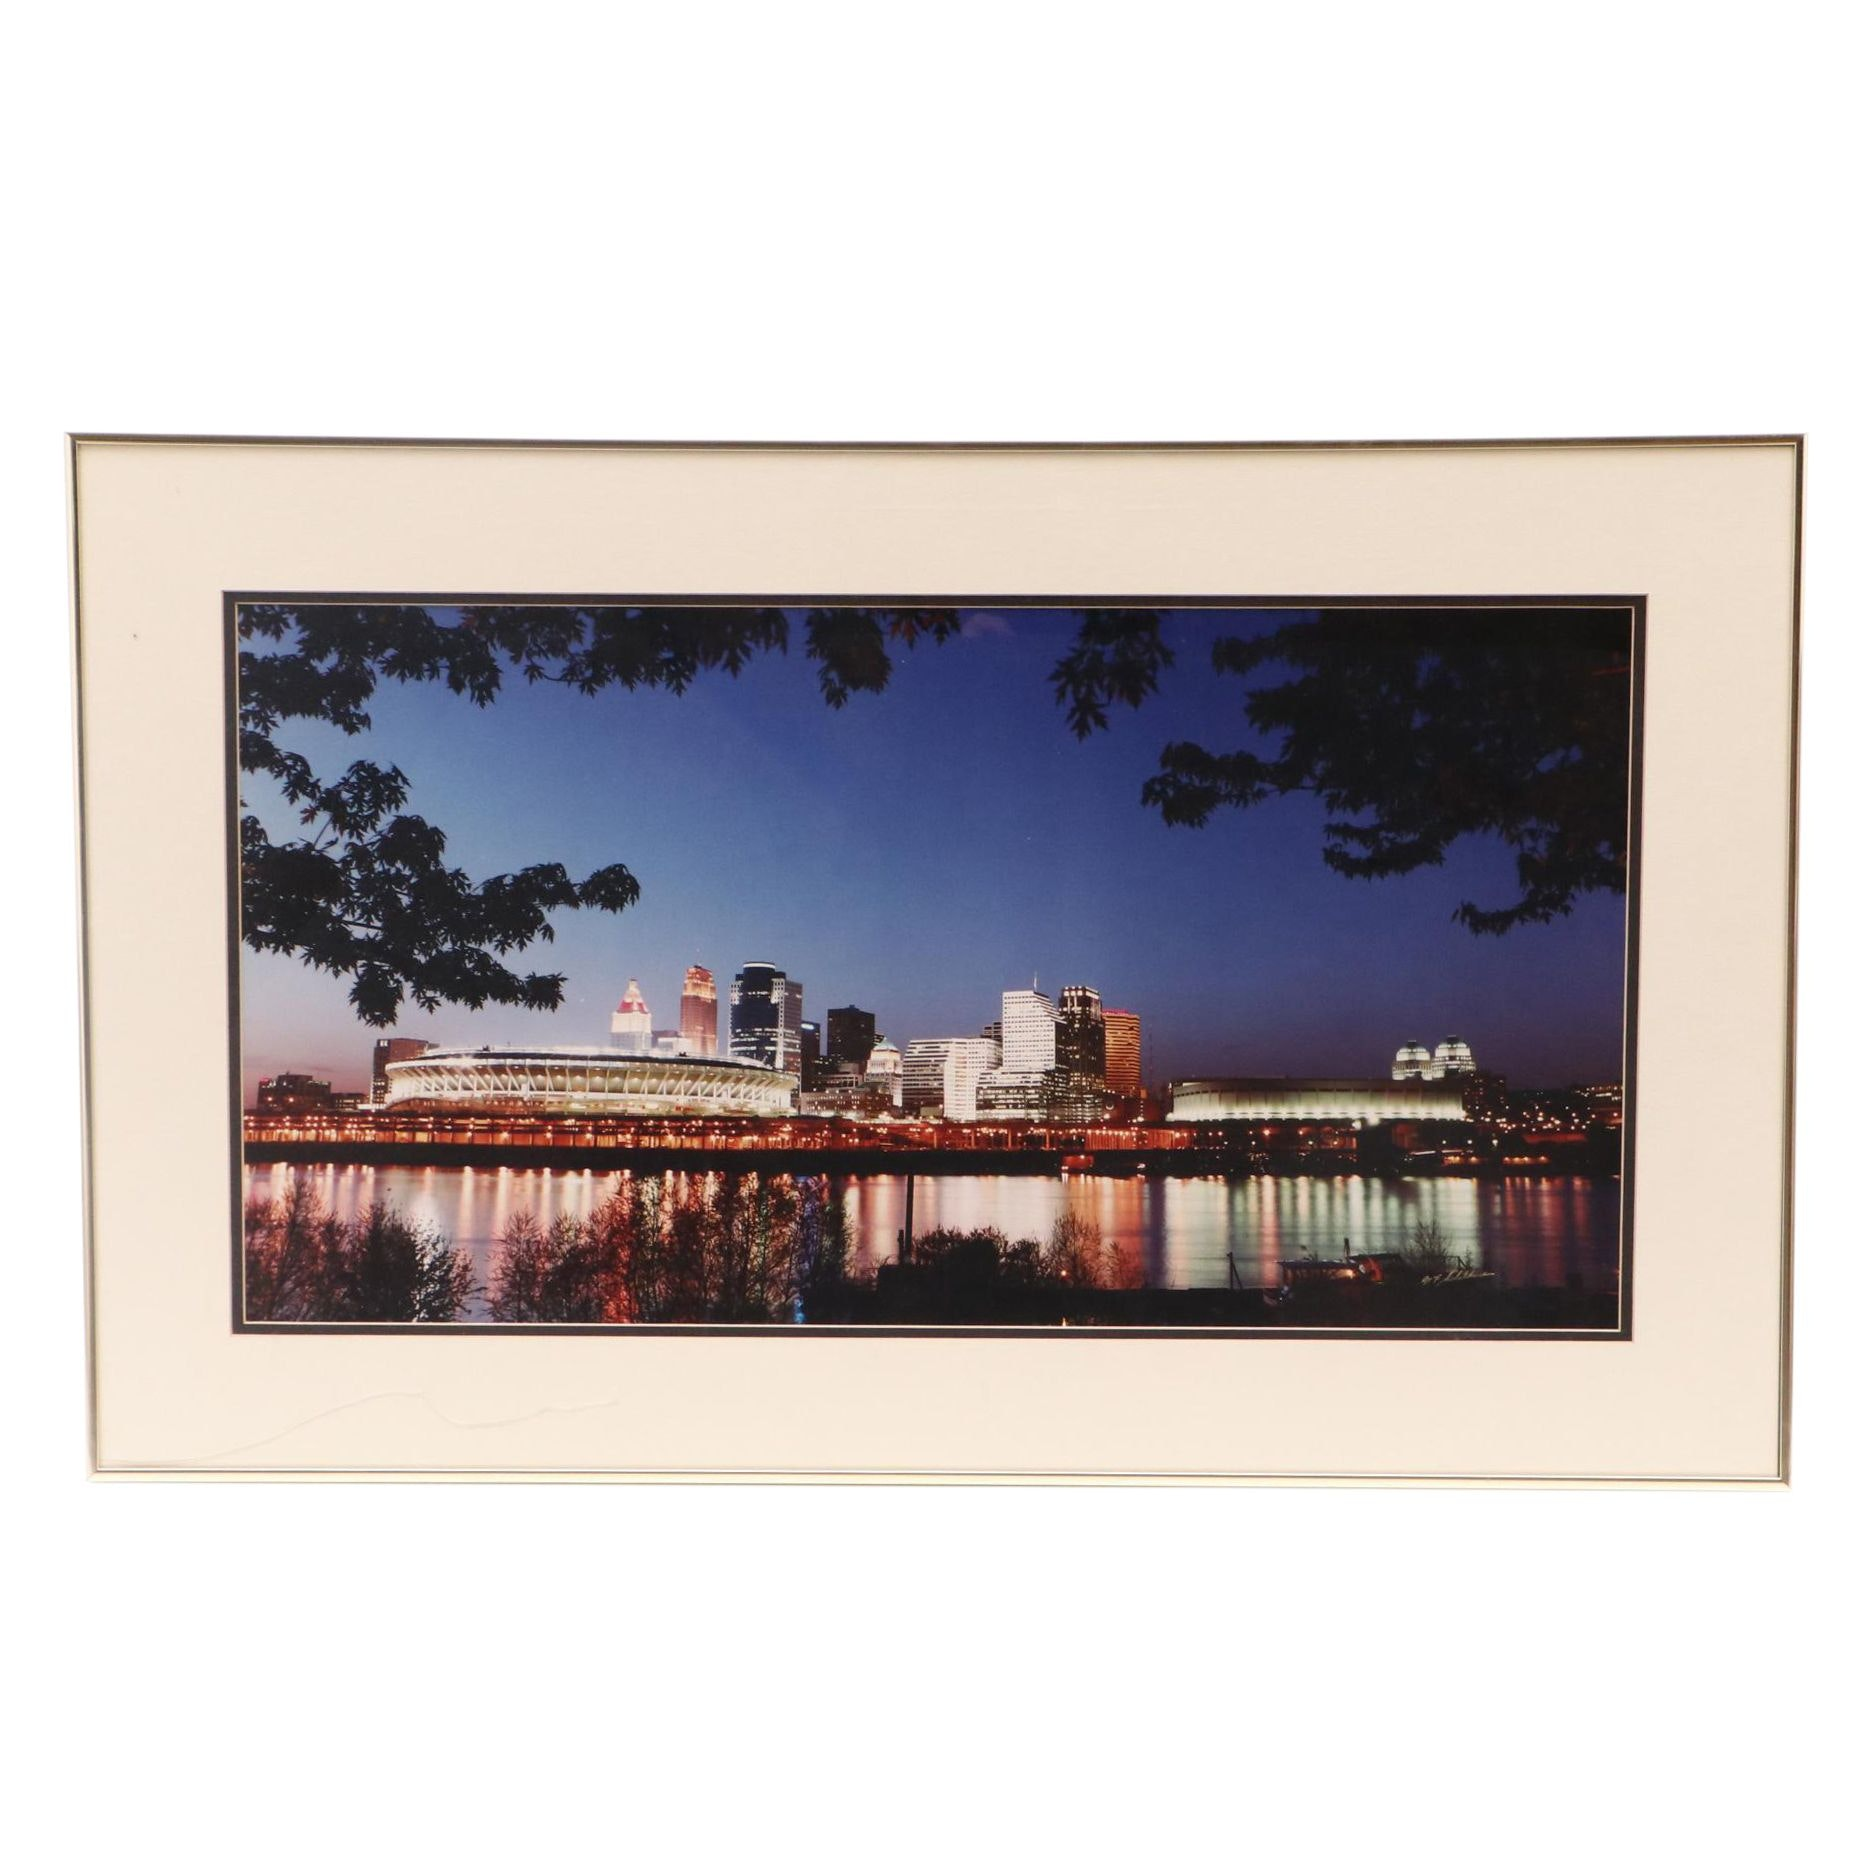 W. F. Schildman Circa 1980s Chromogenic Color Photograph of Cincinnati Skyline